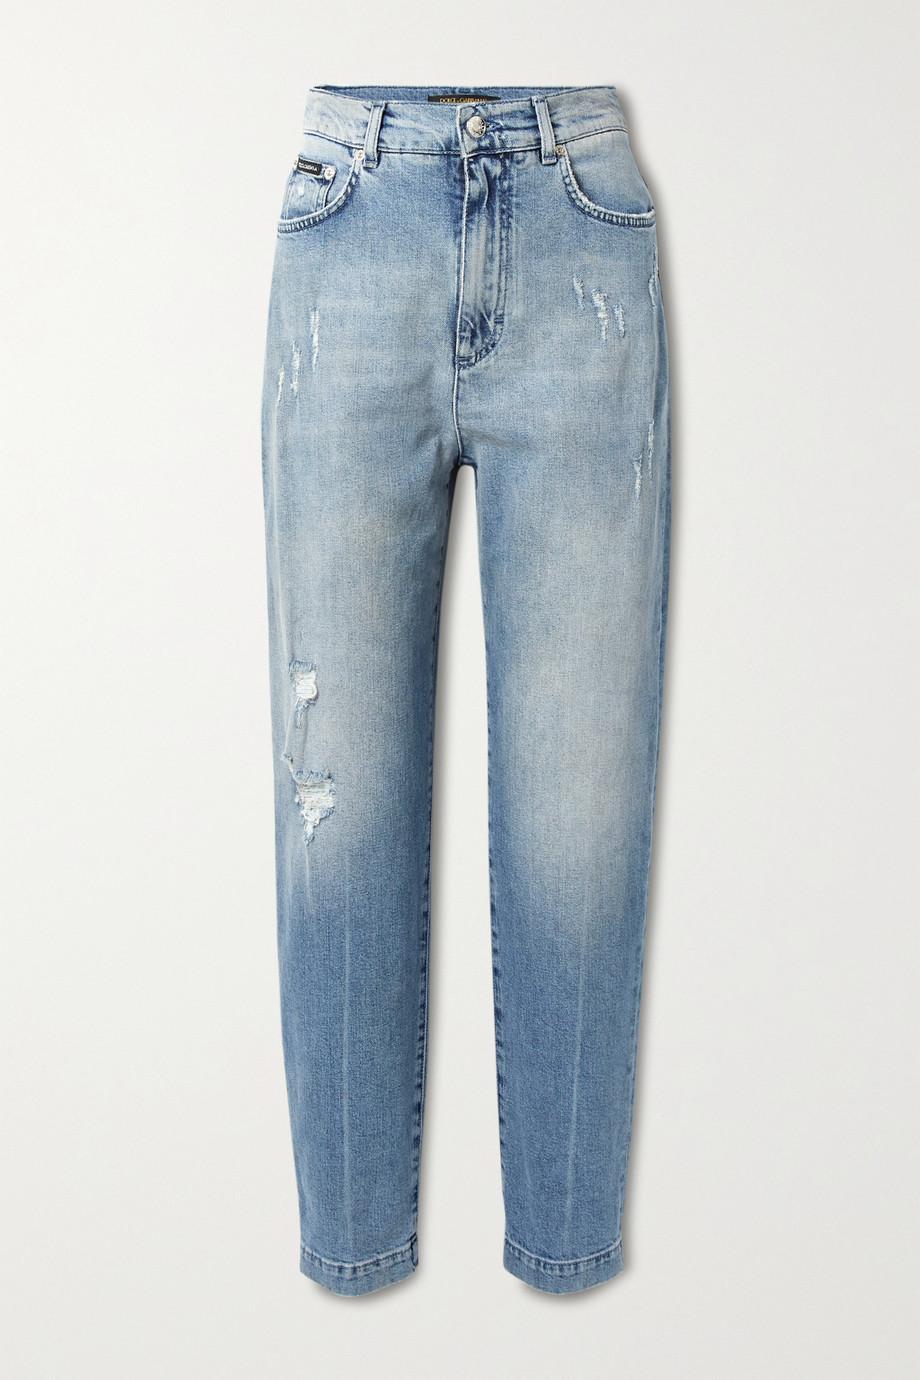 Dolce & Gabbana Distressed high-rise boyfriend jeans